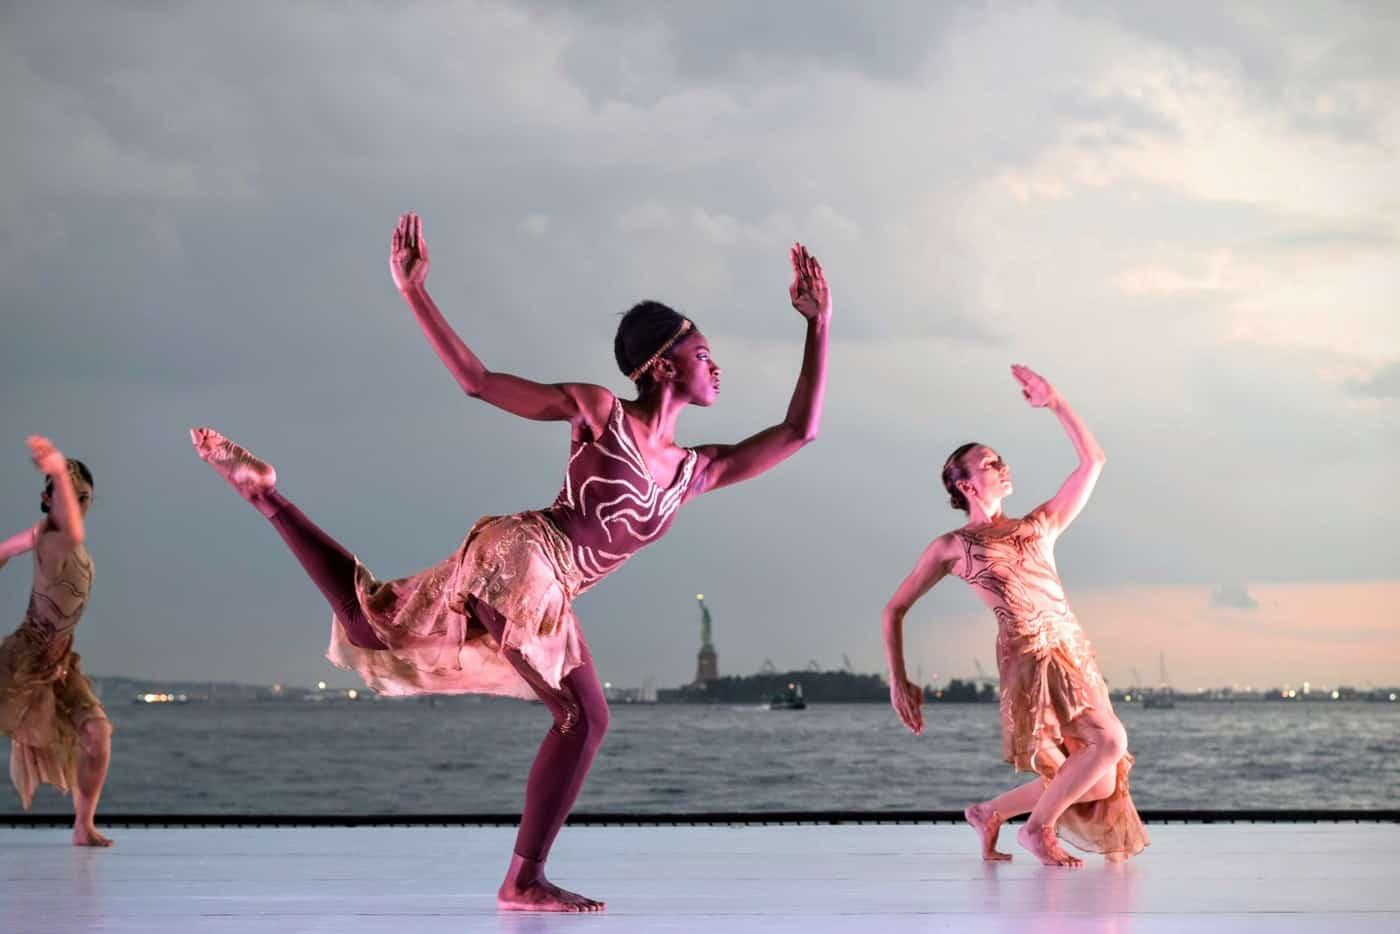 Three women dancing on beach - A guide to Koh Phangan, Thailand